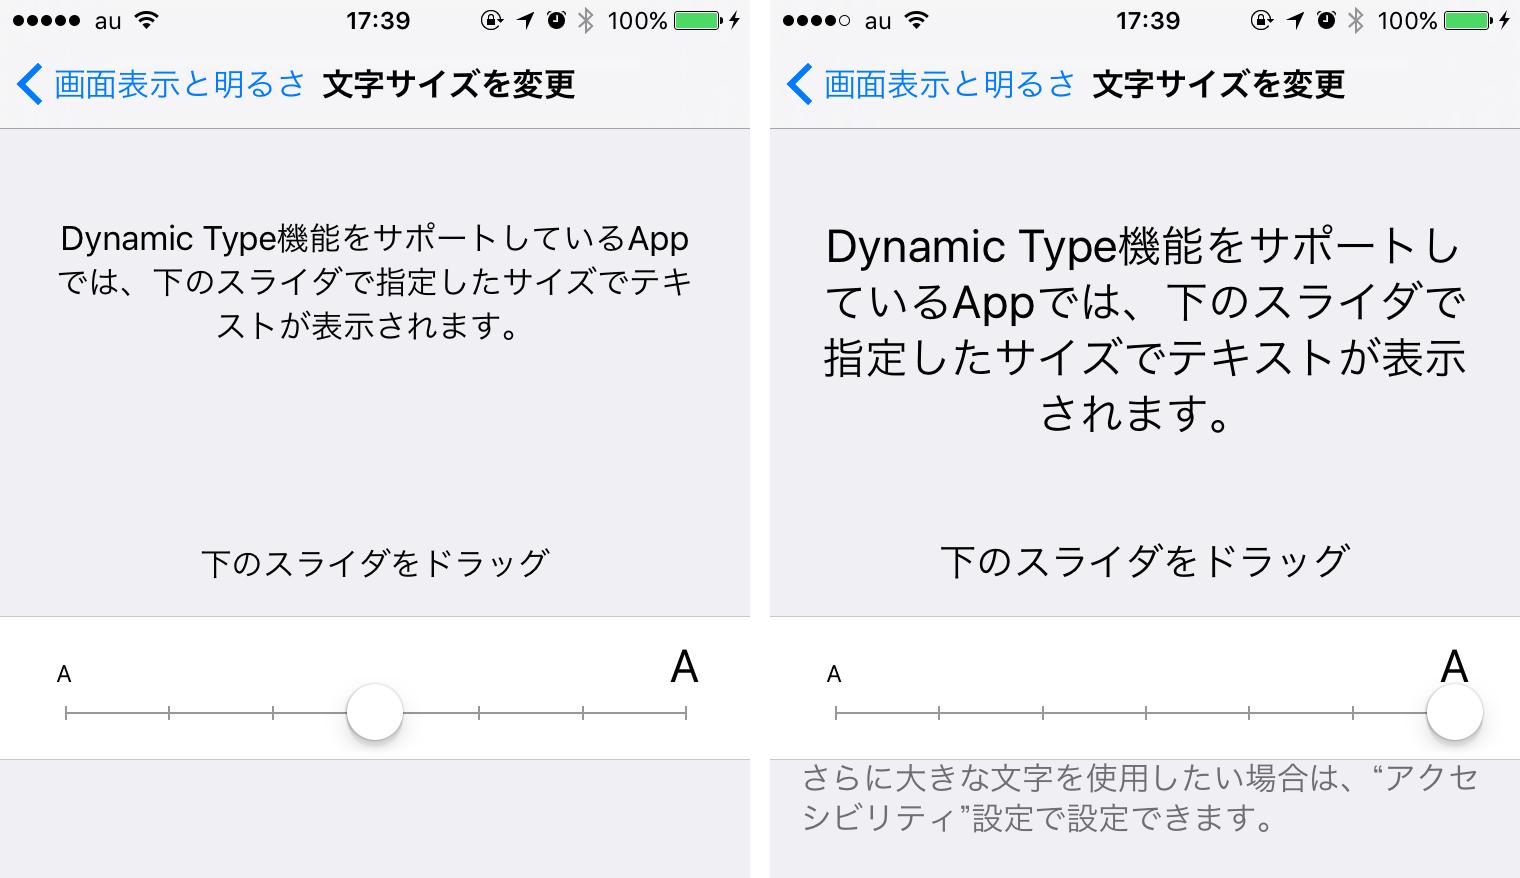 07d086ecb8 iPhoneの画面見やすさ大幅アップ!文字サイズをカンタンに大きくする:iPhone Tips - Engadget 日本版